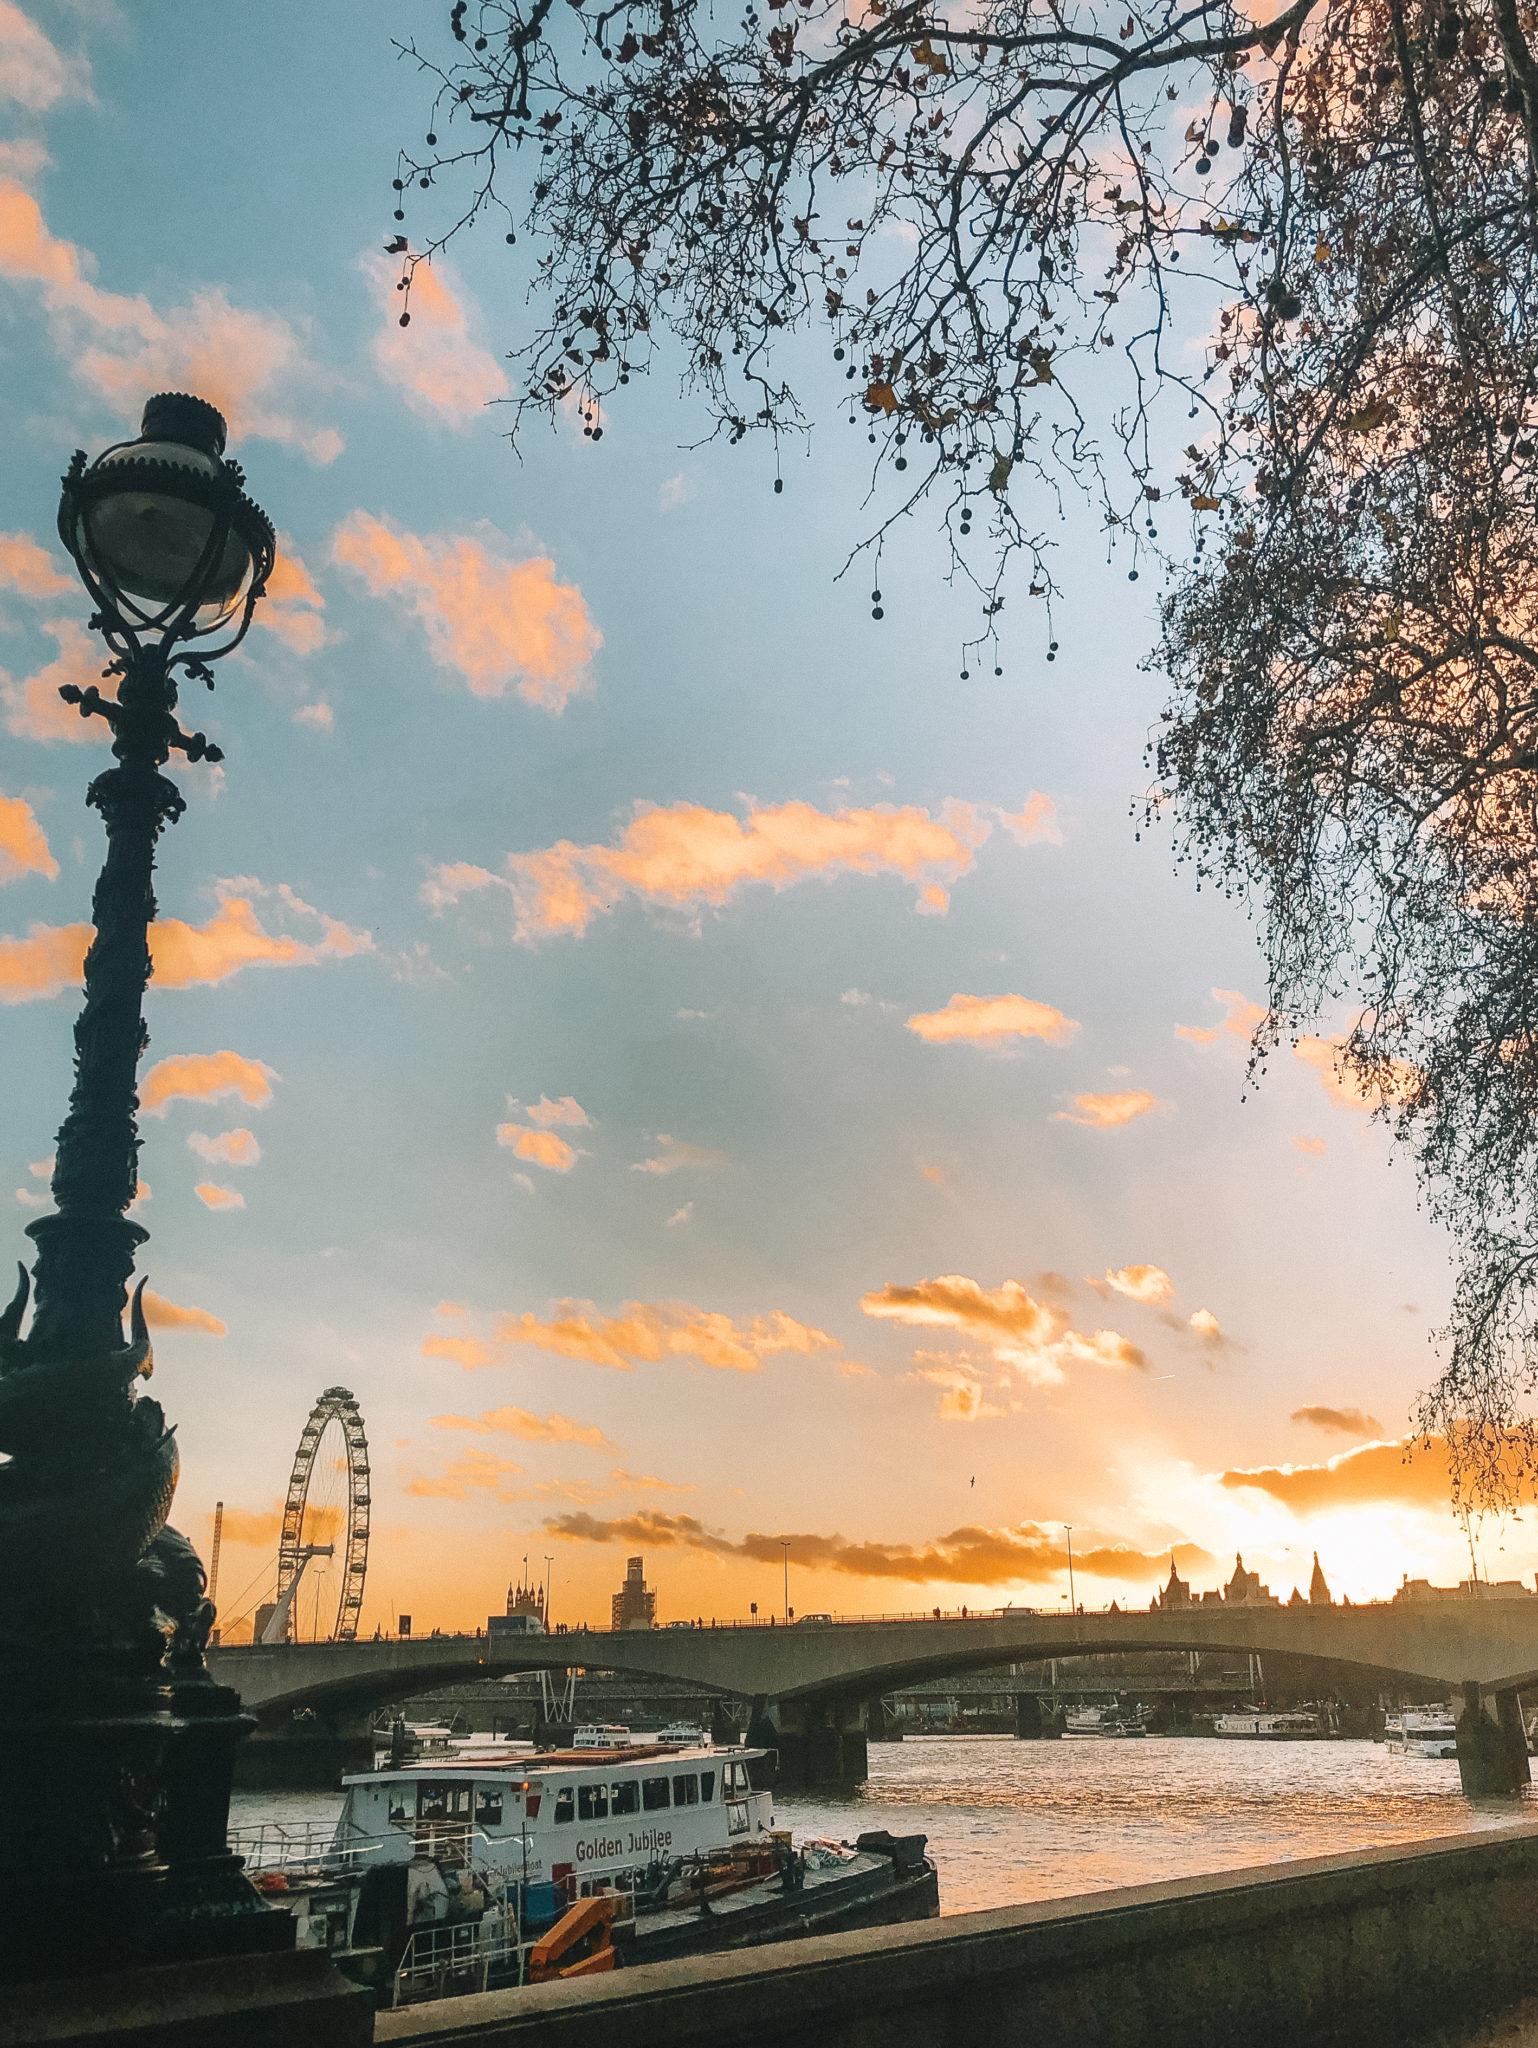 London River Thames | WORLD OF WANDERLUST